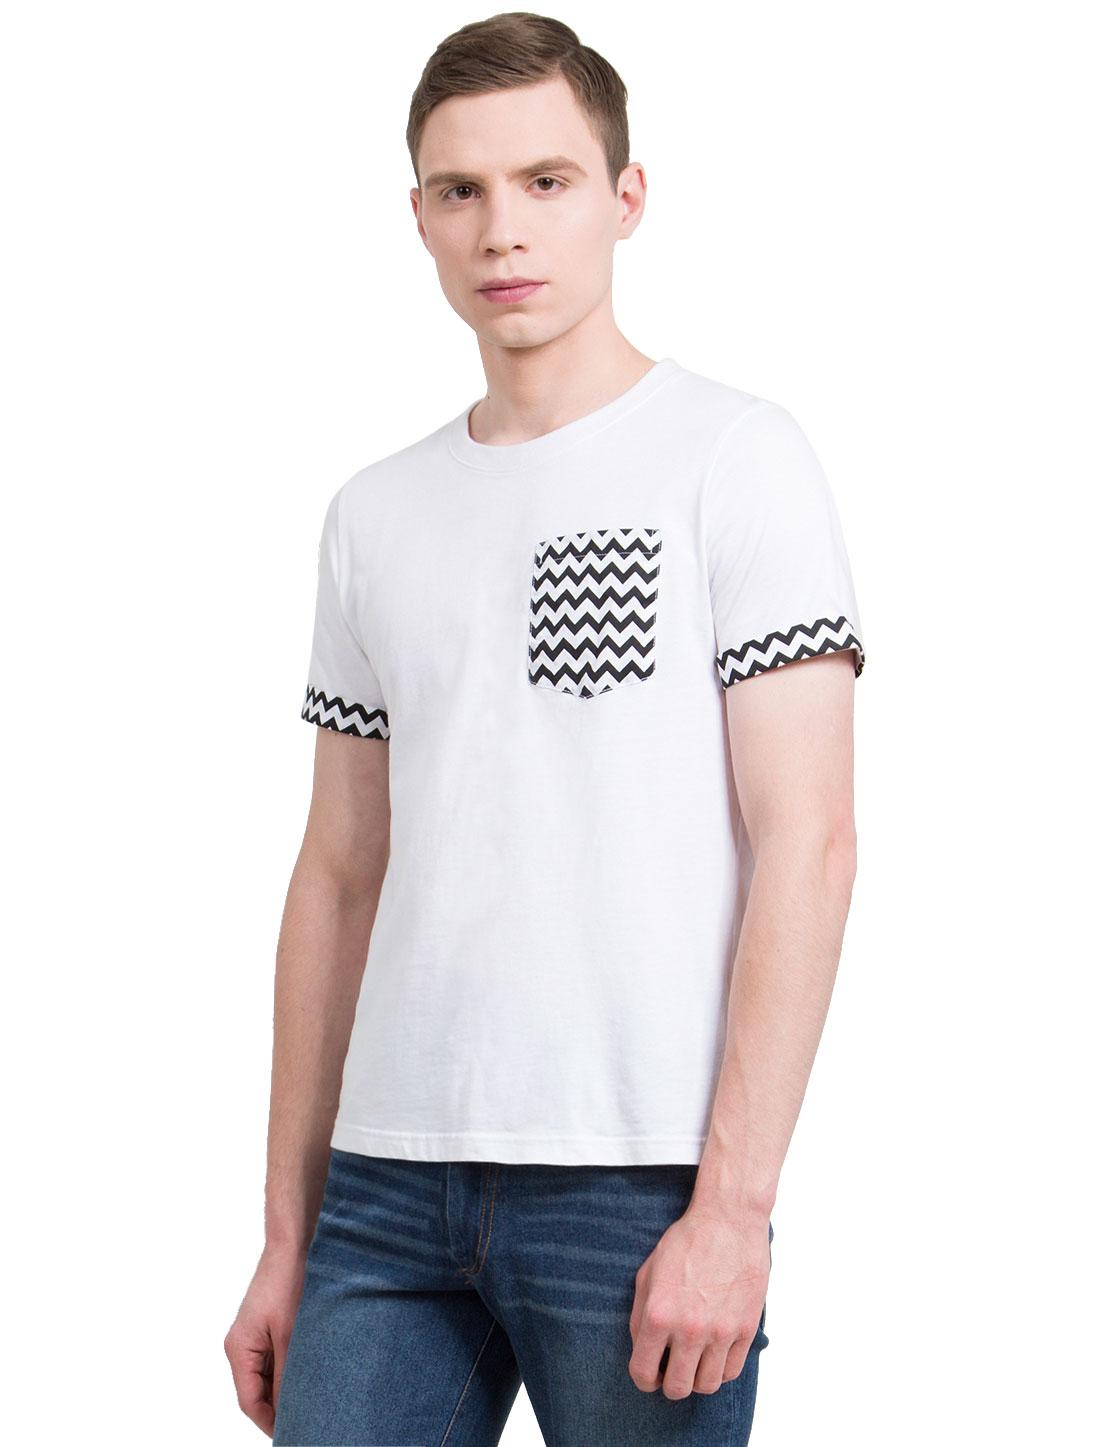 Men Crew Neck Short Sleeves Chevron Print Cotton T-Shirt White L